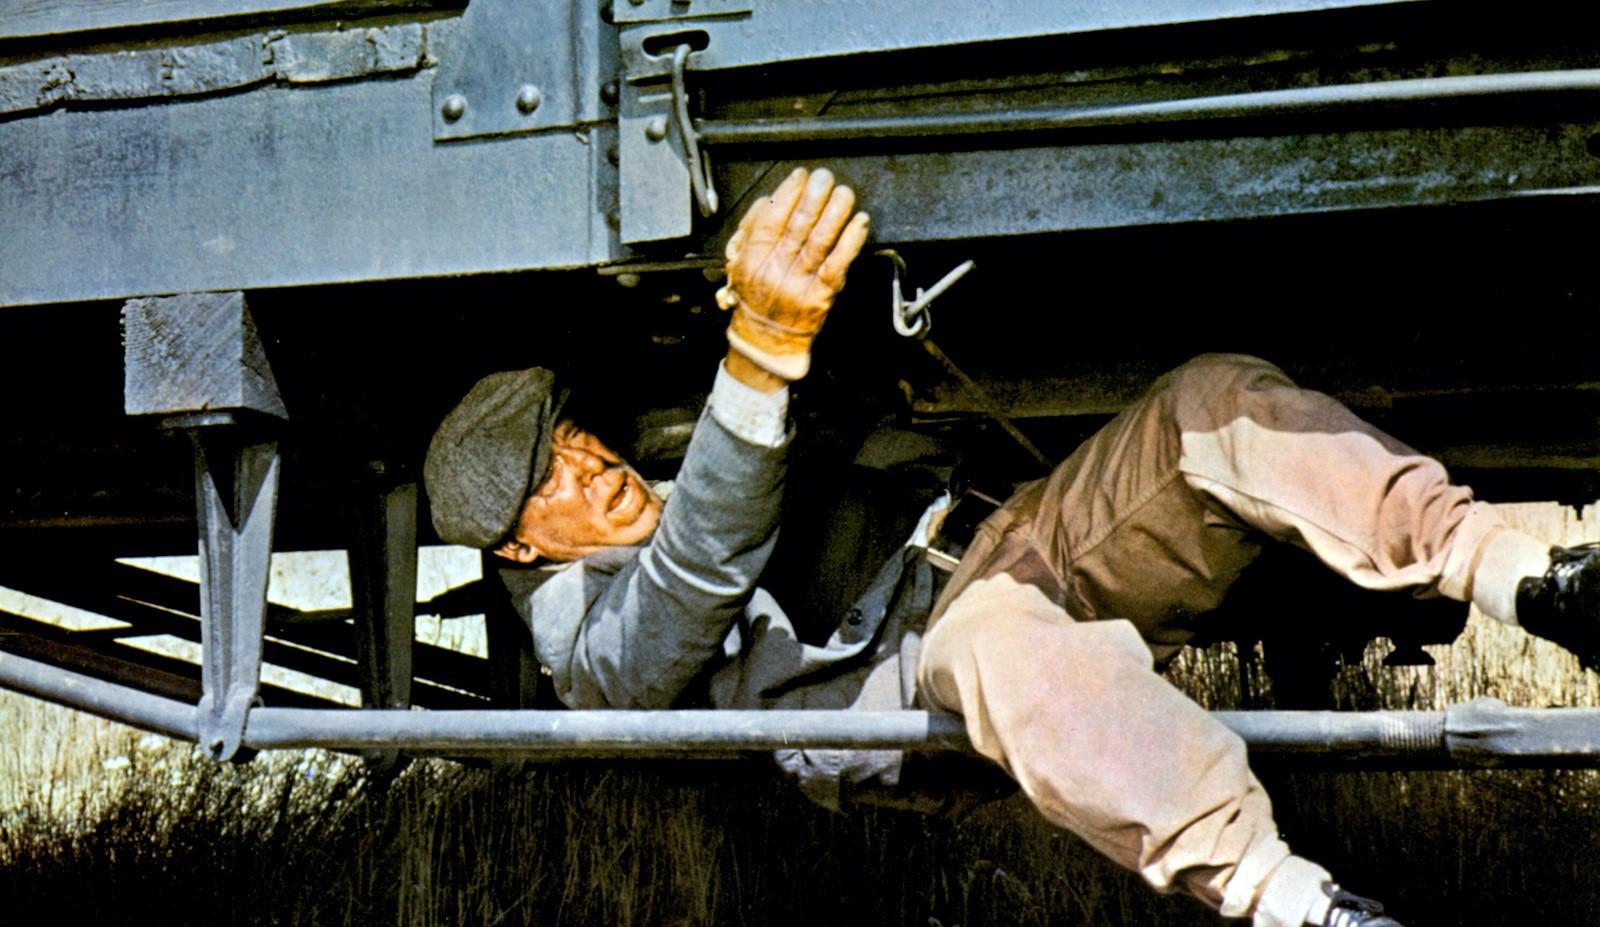 lee marvin dans L'Empereur du Nord (1973) de Robert Aldrich